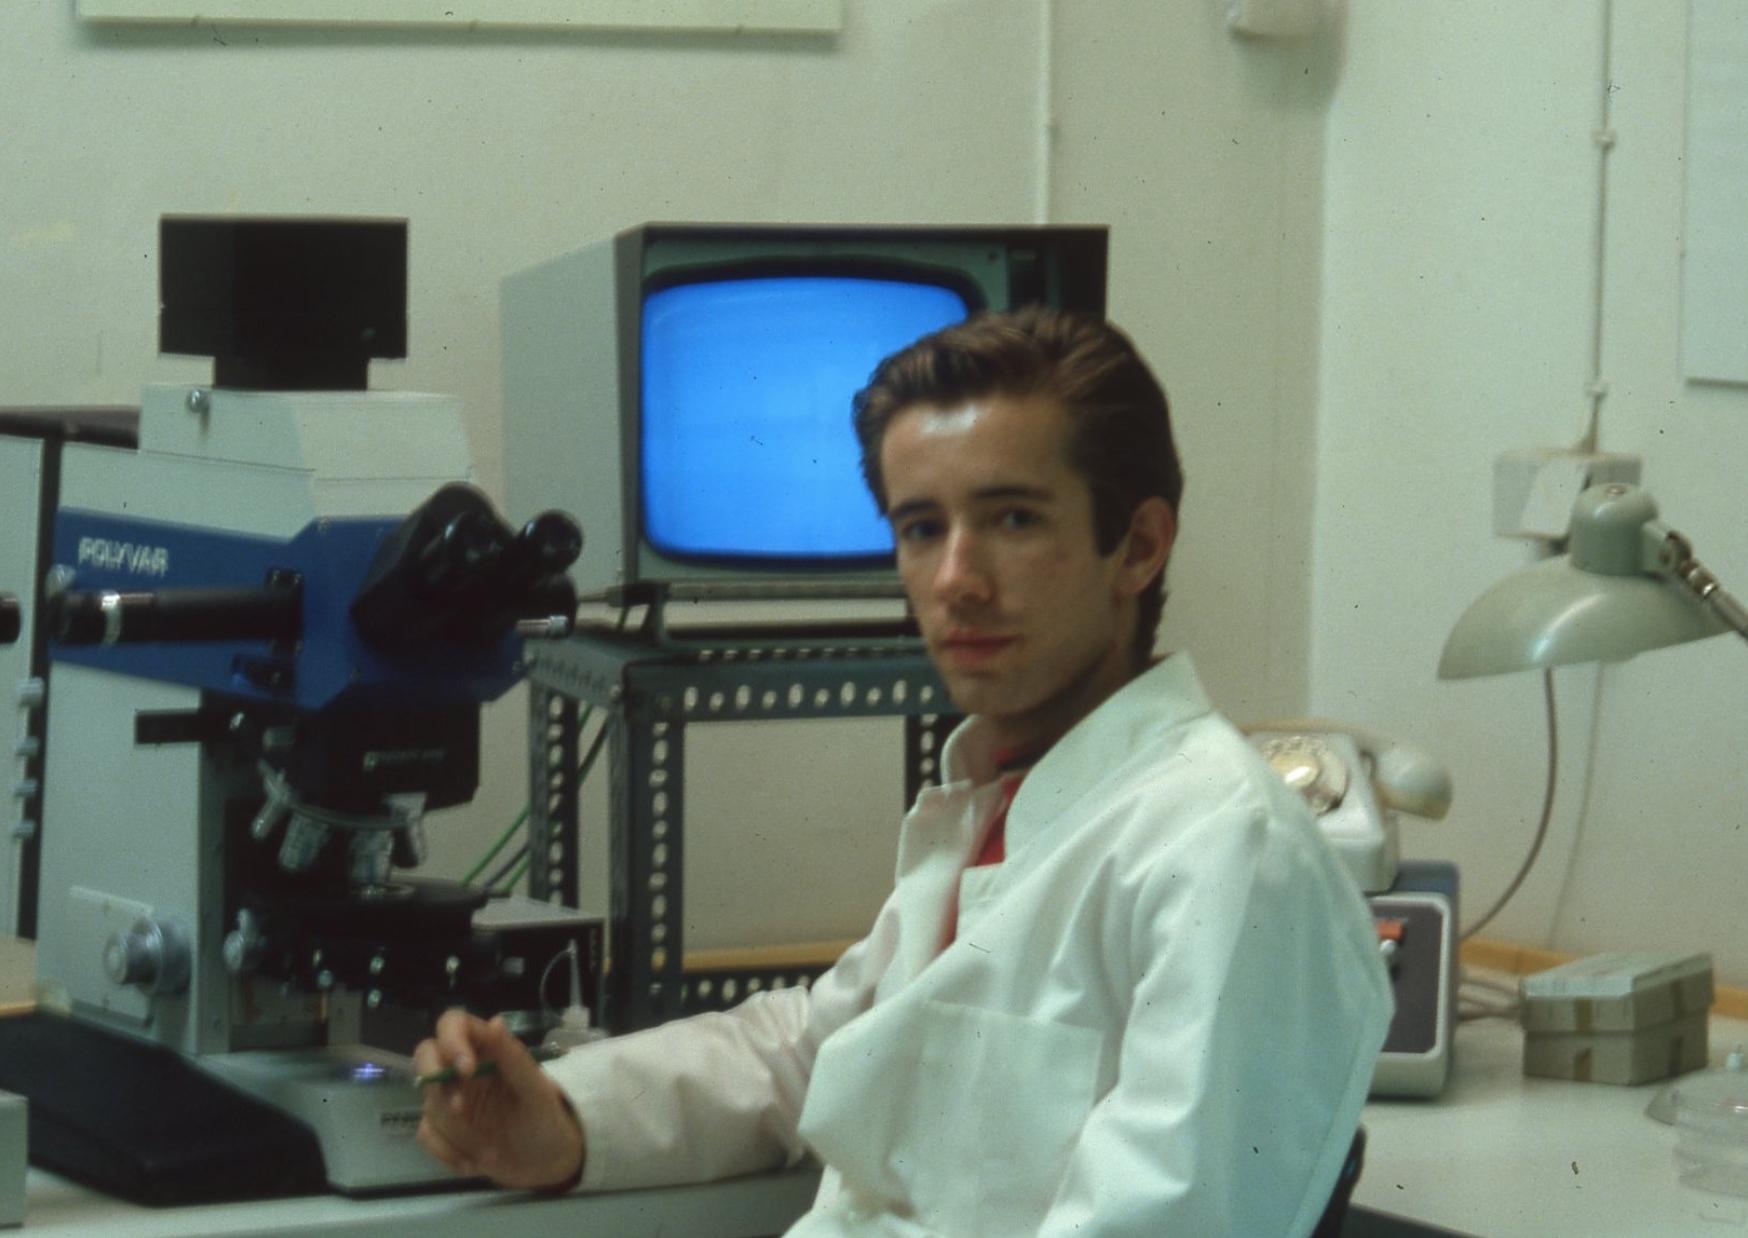 Carsten Höller., Institute of Phytopathology, University of Kiel, ca. 1988. © Carsten Höller Studio, photographer unknown.